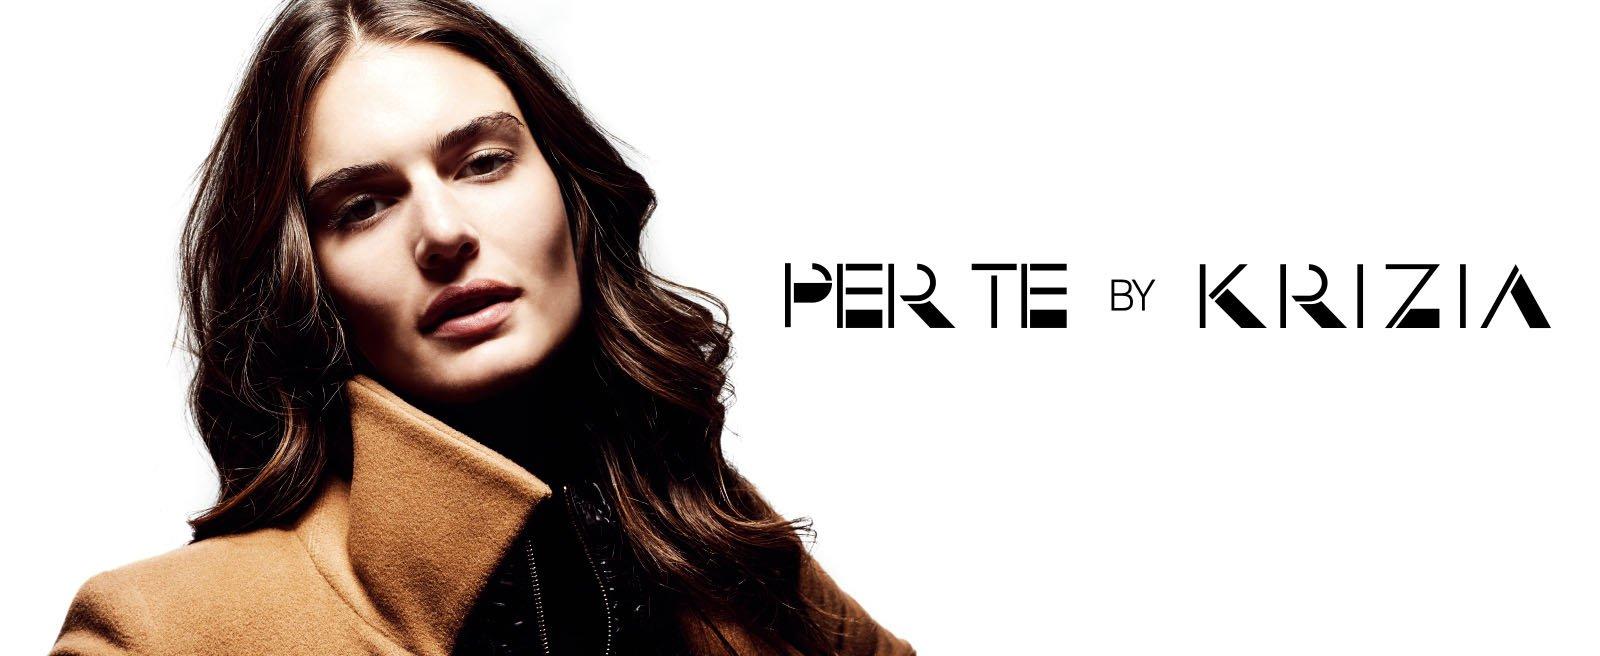 Perte by Kriza L'Usine Moode & Maisn